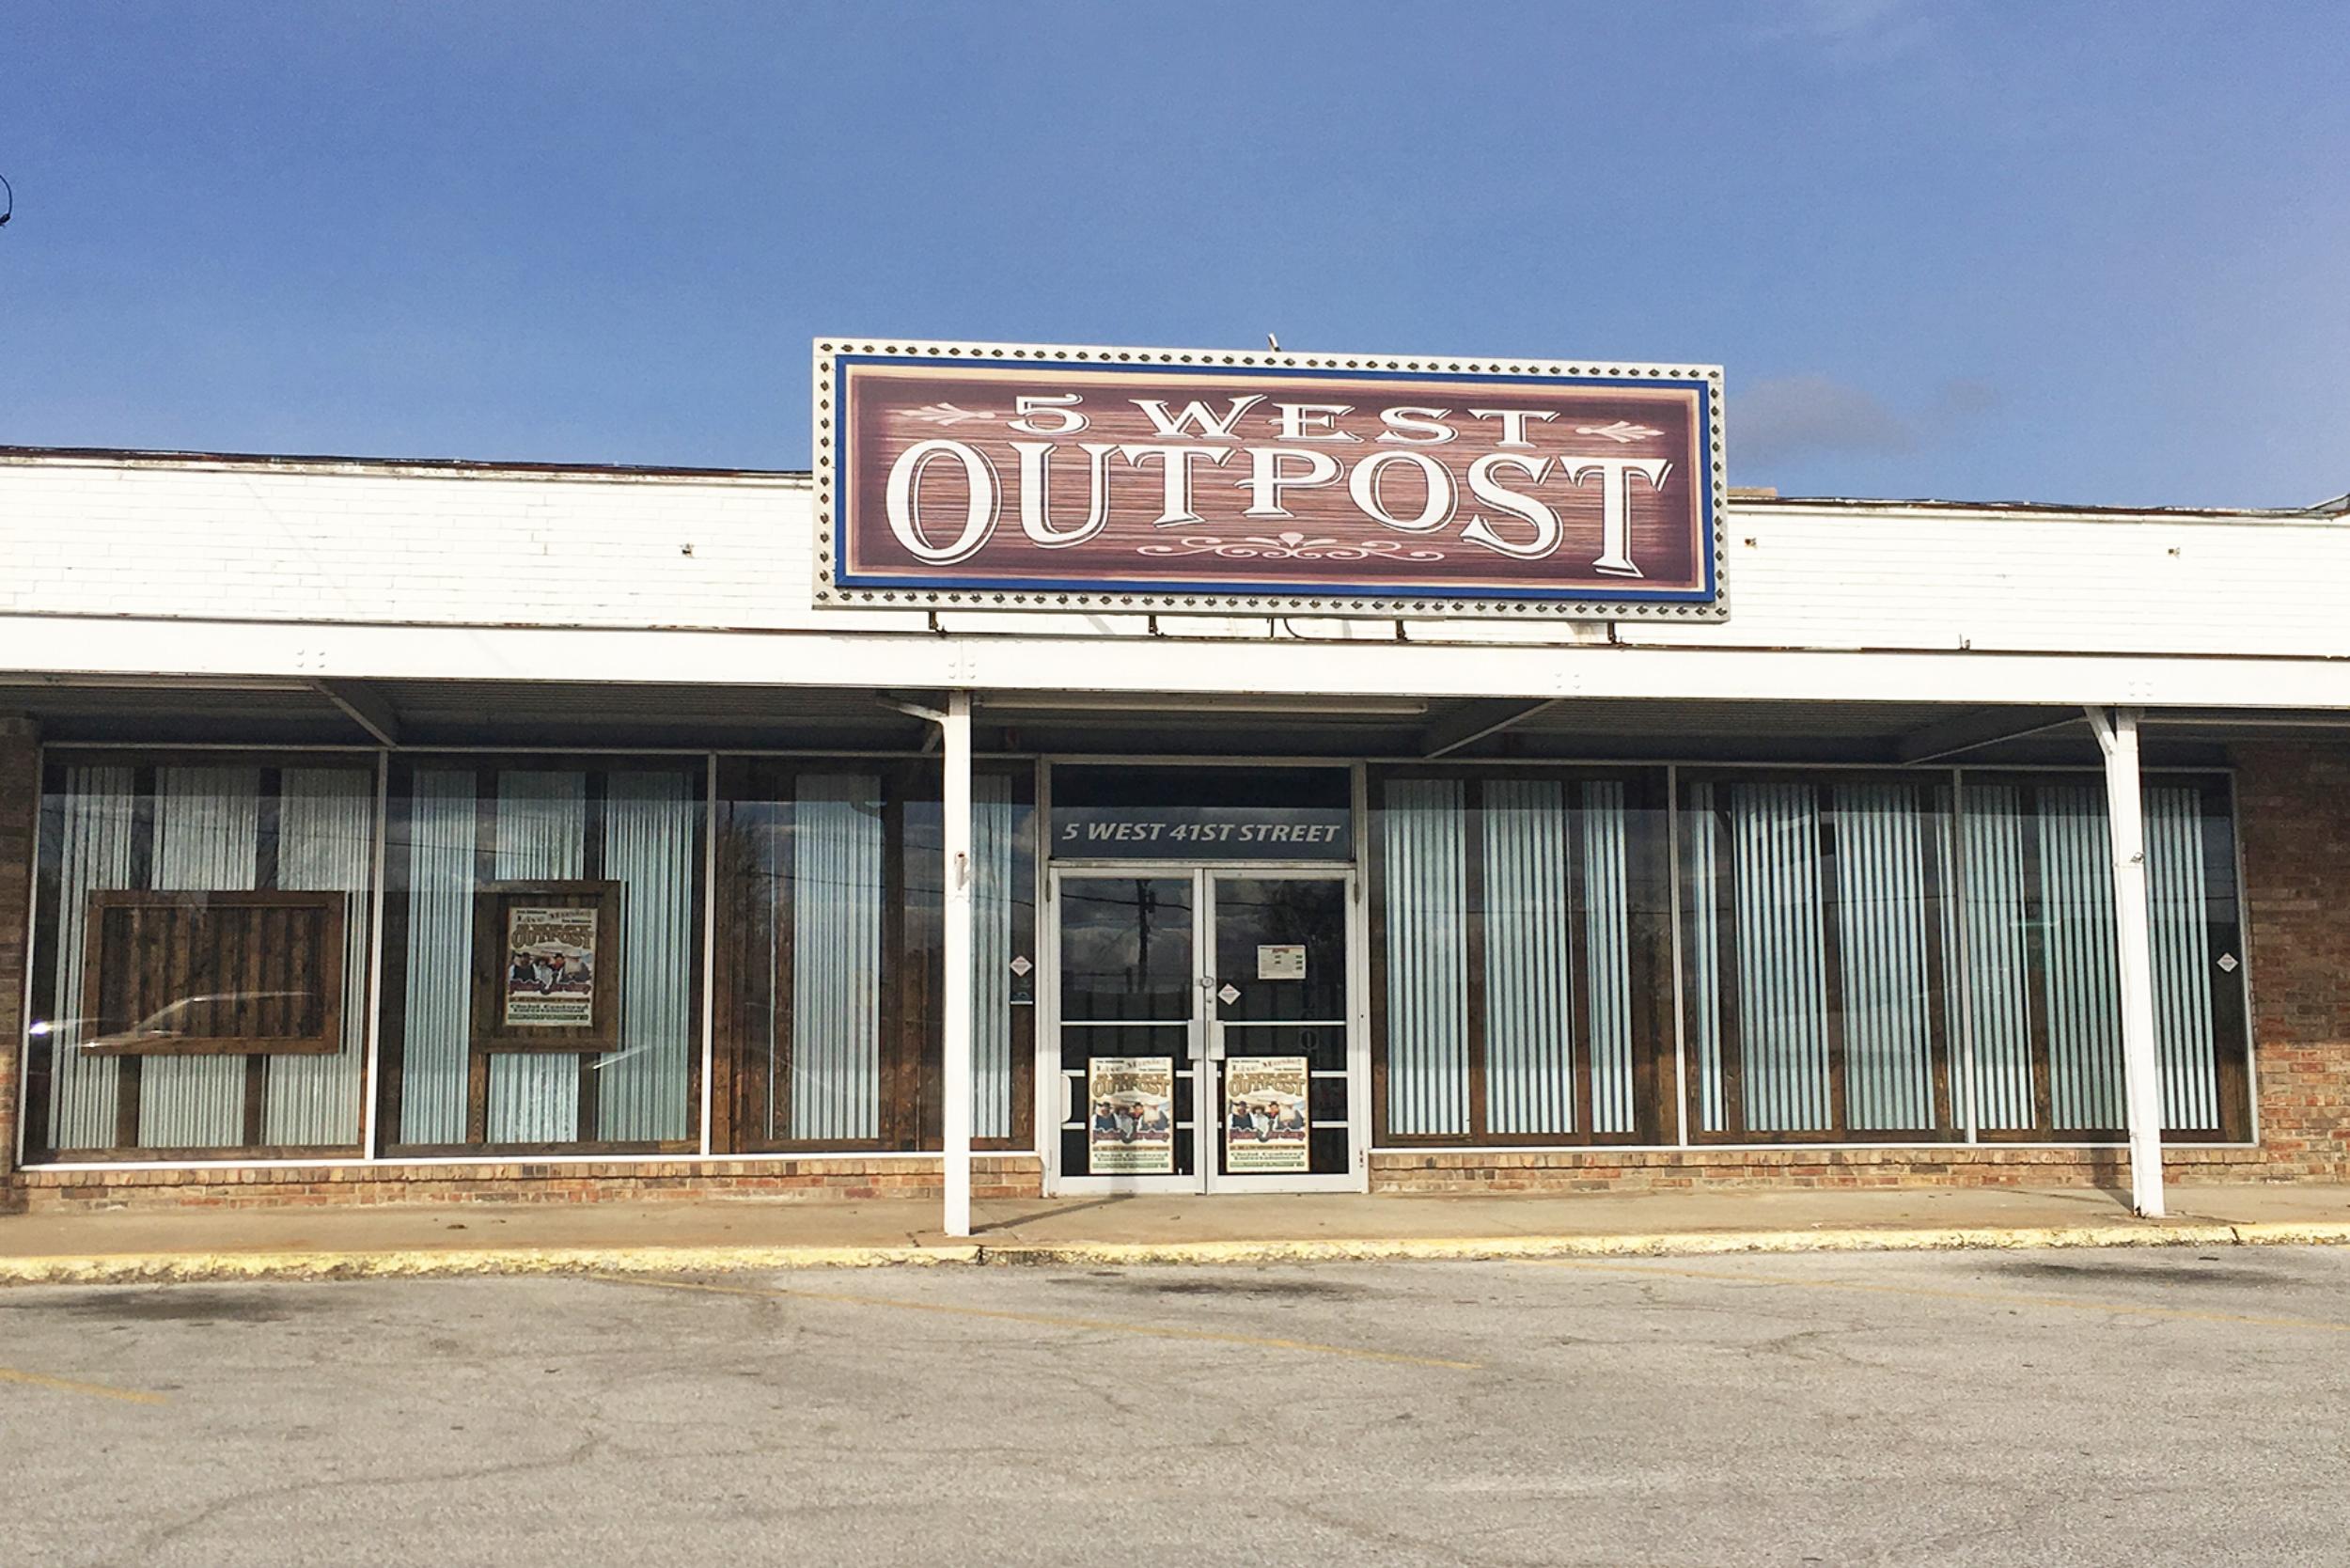 5 west outpost - prattville 5 west 41st street